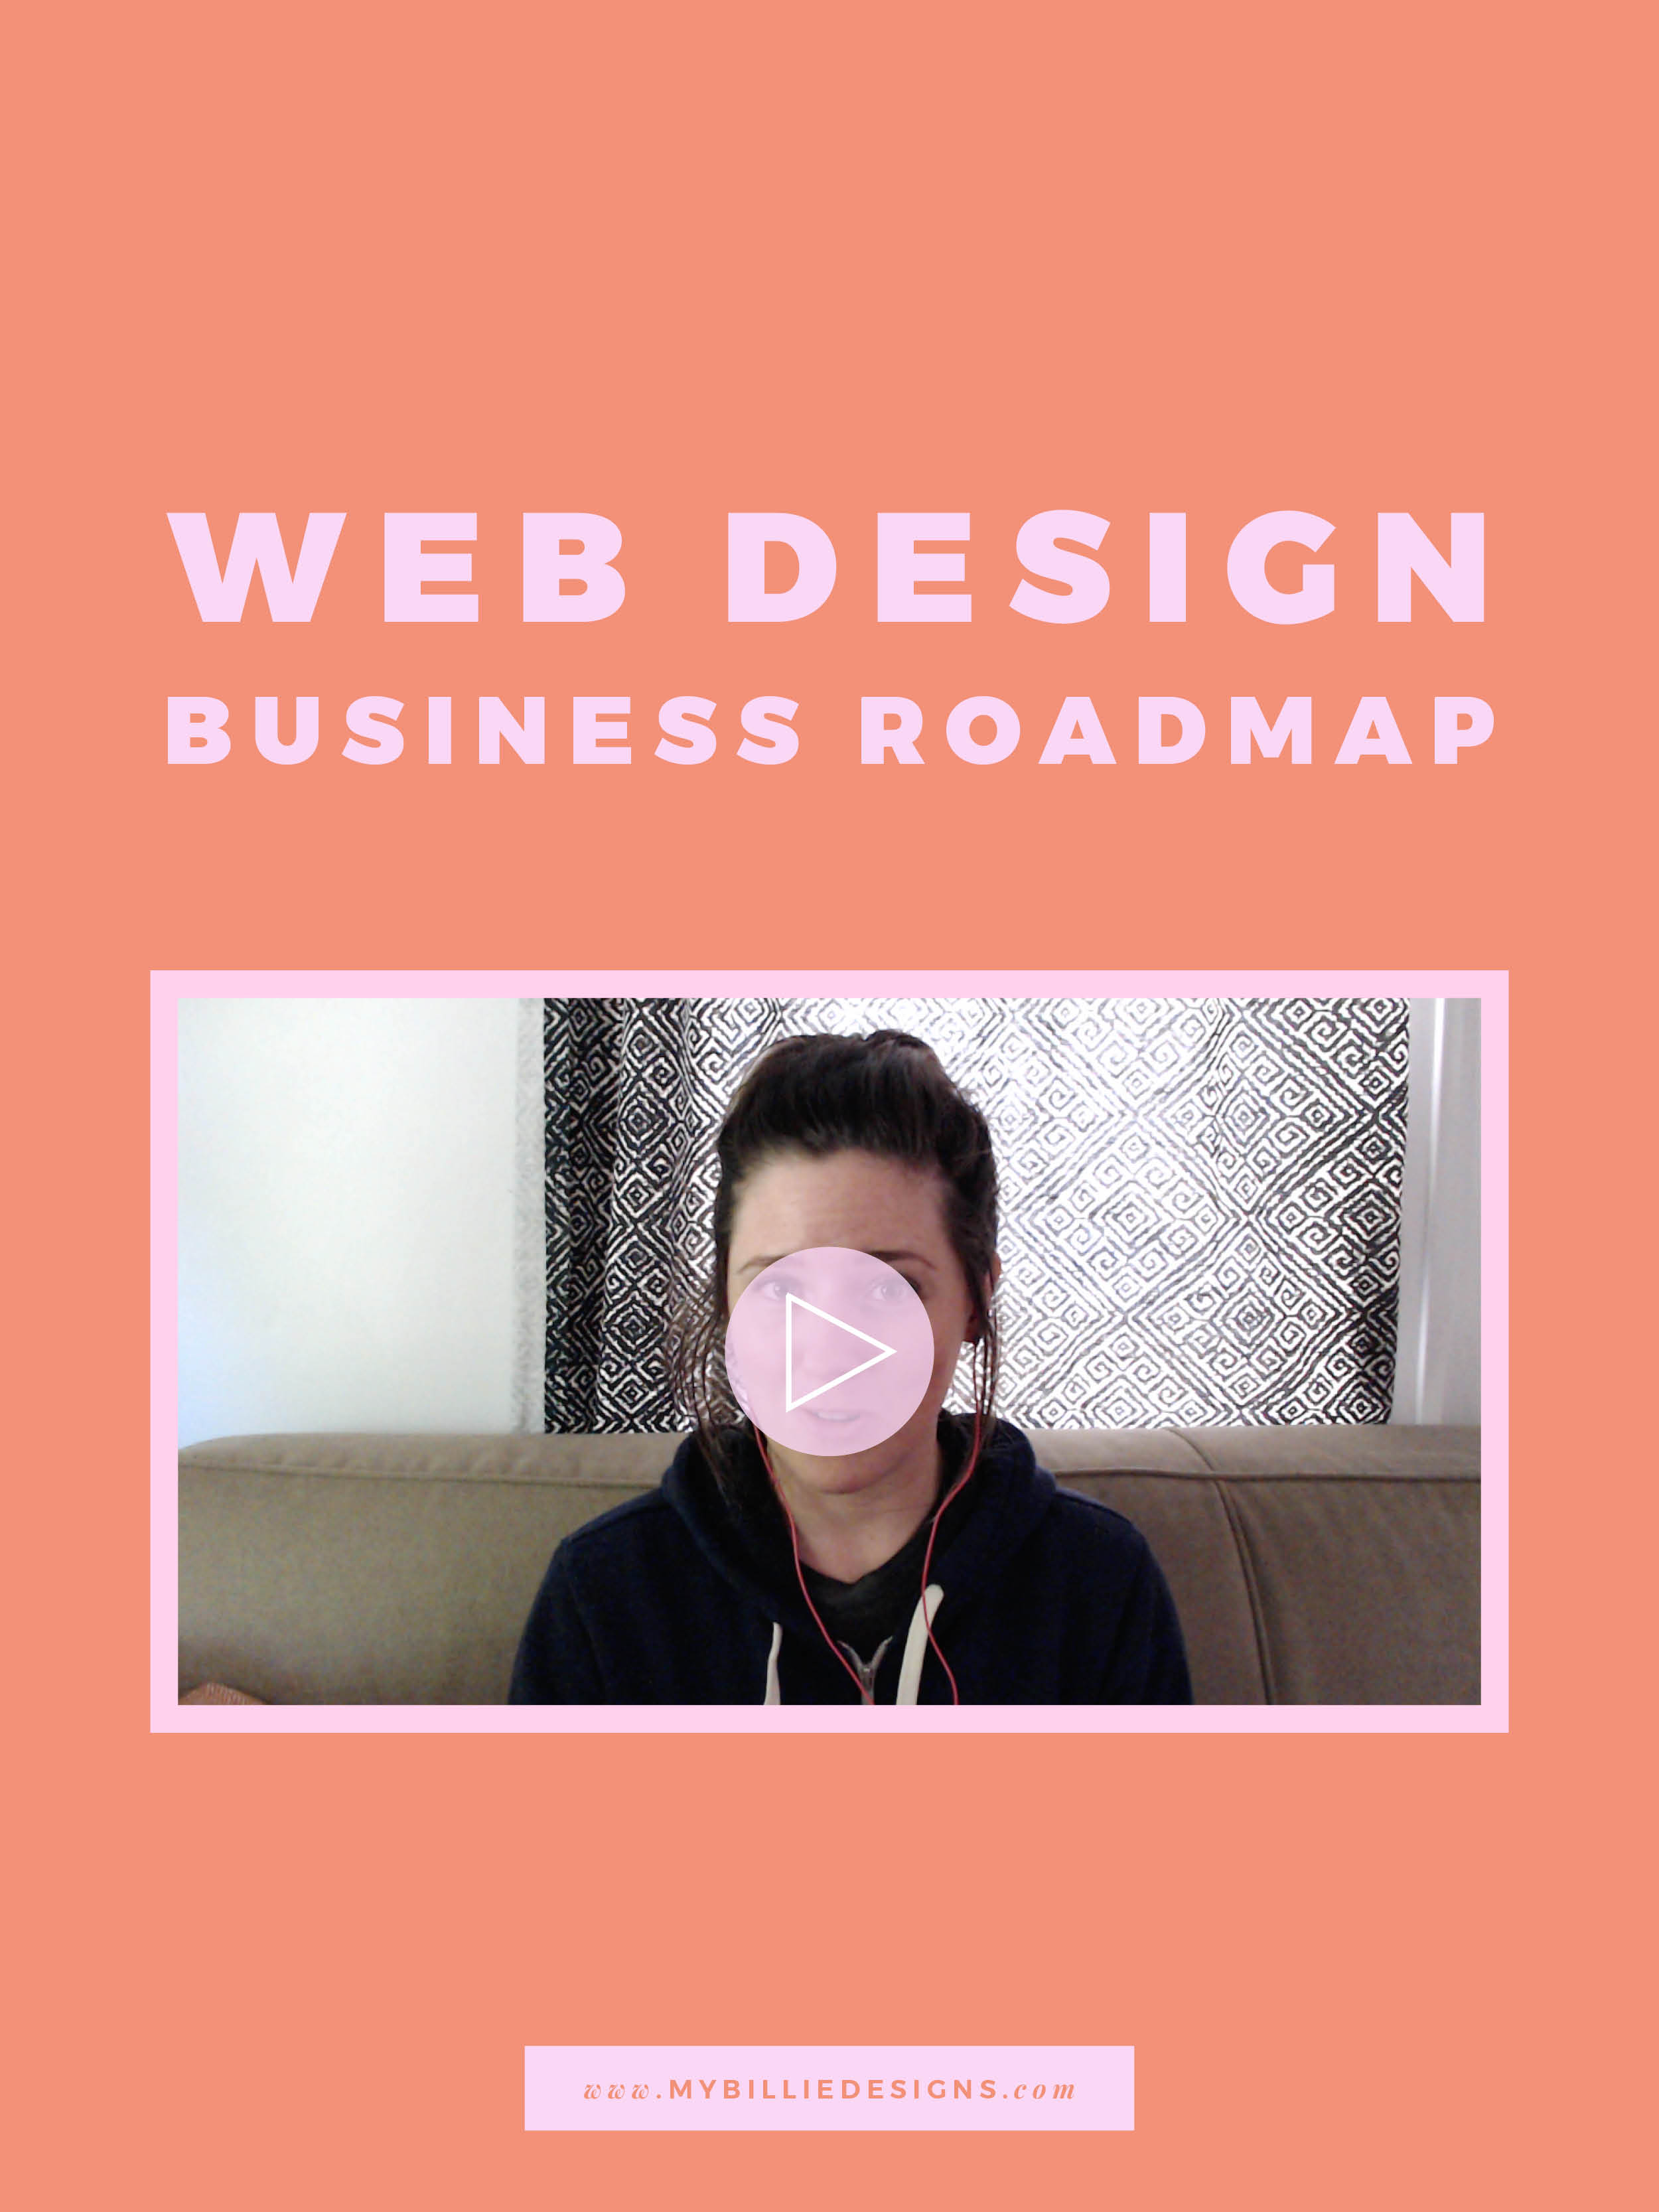 Web Design Business Roadmap Intro Video.jpg